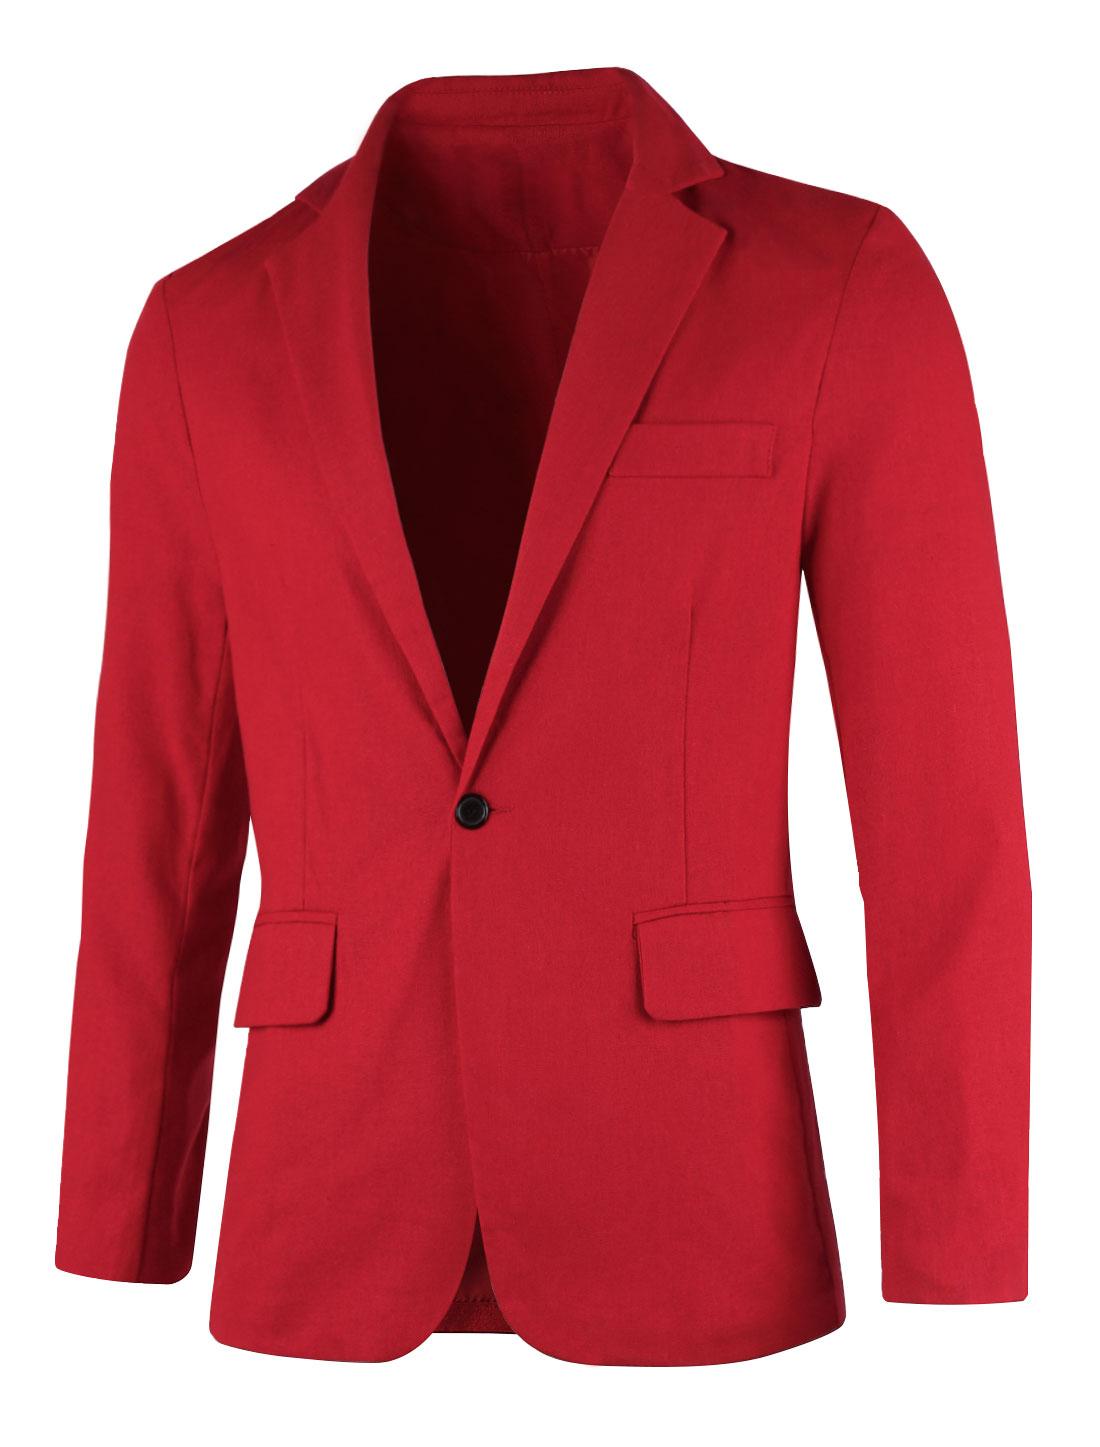 Men Long Sleeve Notched Lapel Pockets Slim Fit Blazer Coat Burgundy L